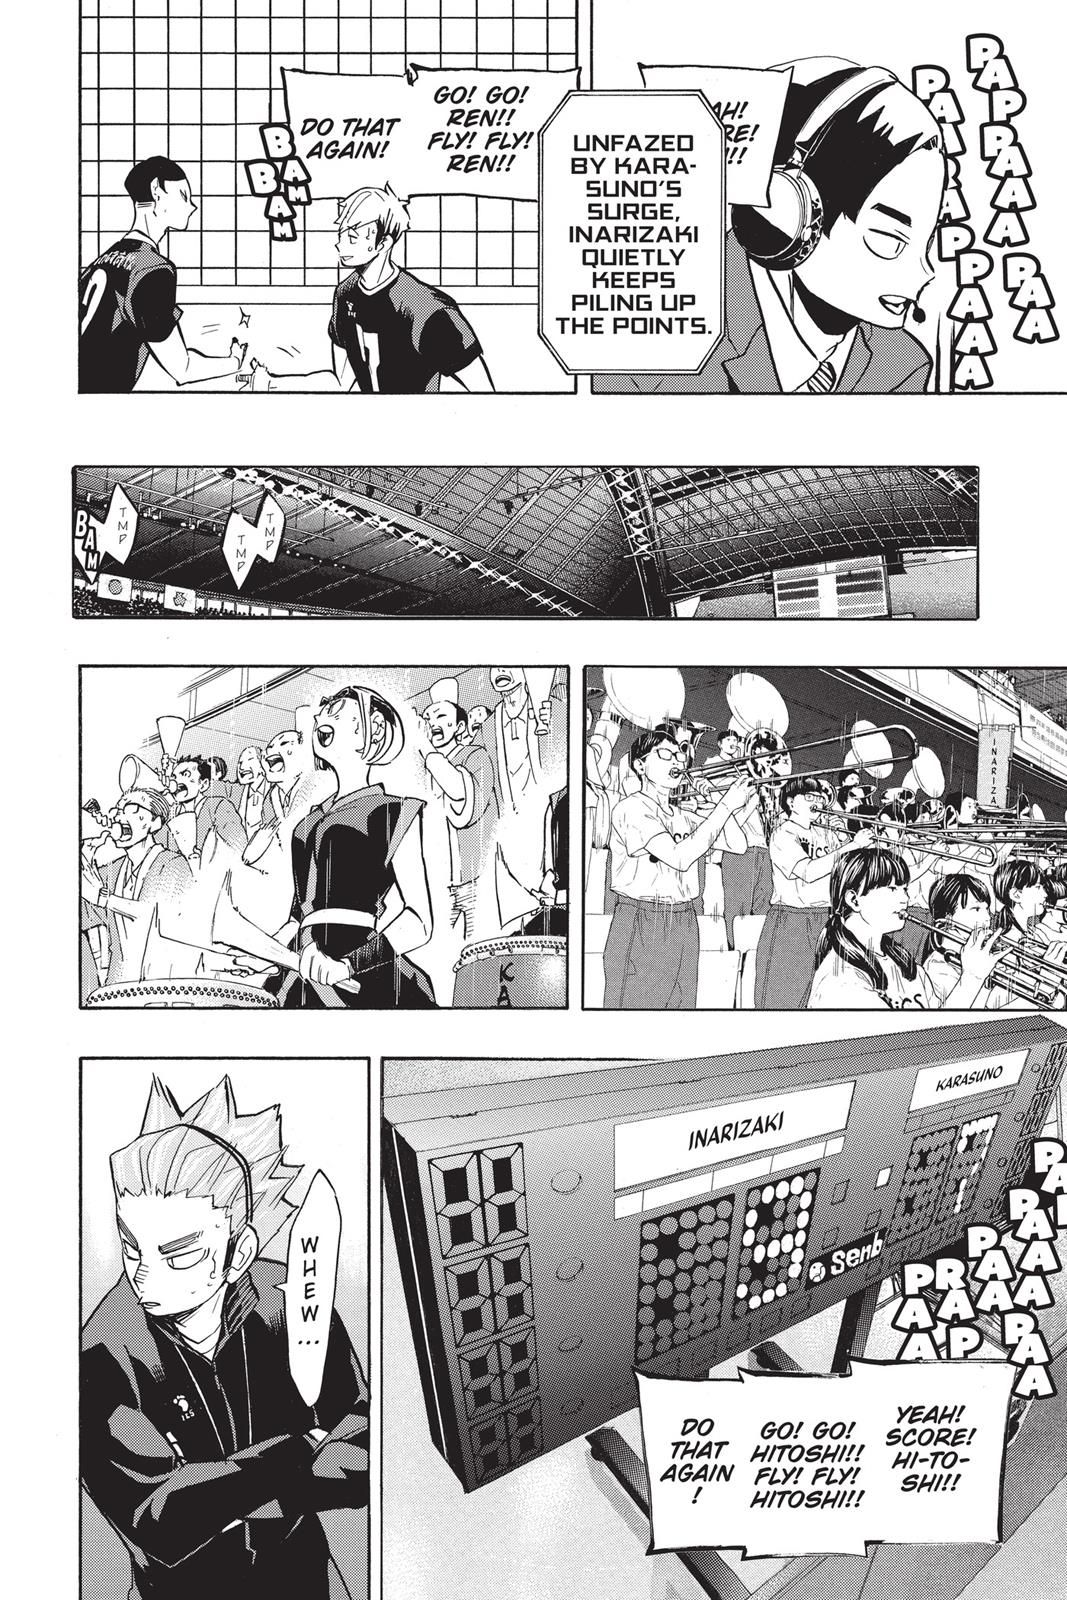 Haikyuu Chapter 253 Read Haikyuu Manga Online Haikyuu Haikyuu Anime Chapter Although short tall, he becomes motivated. haikyuu chapter 253 read haikyuu